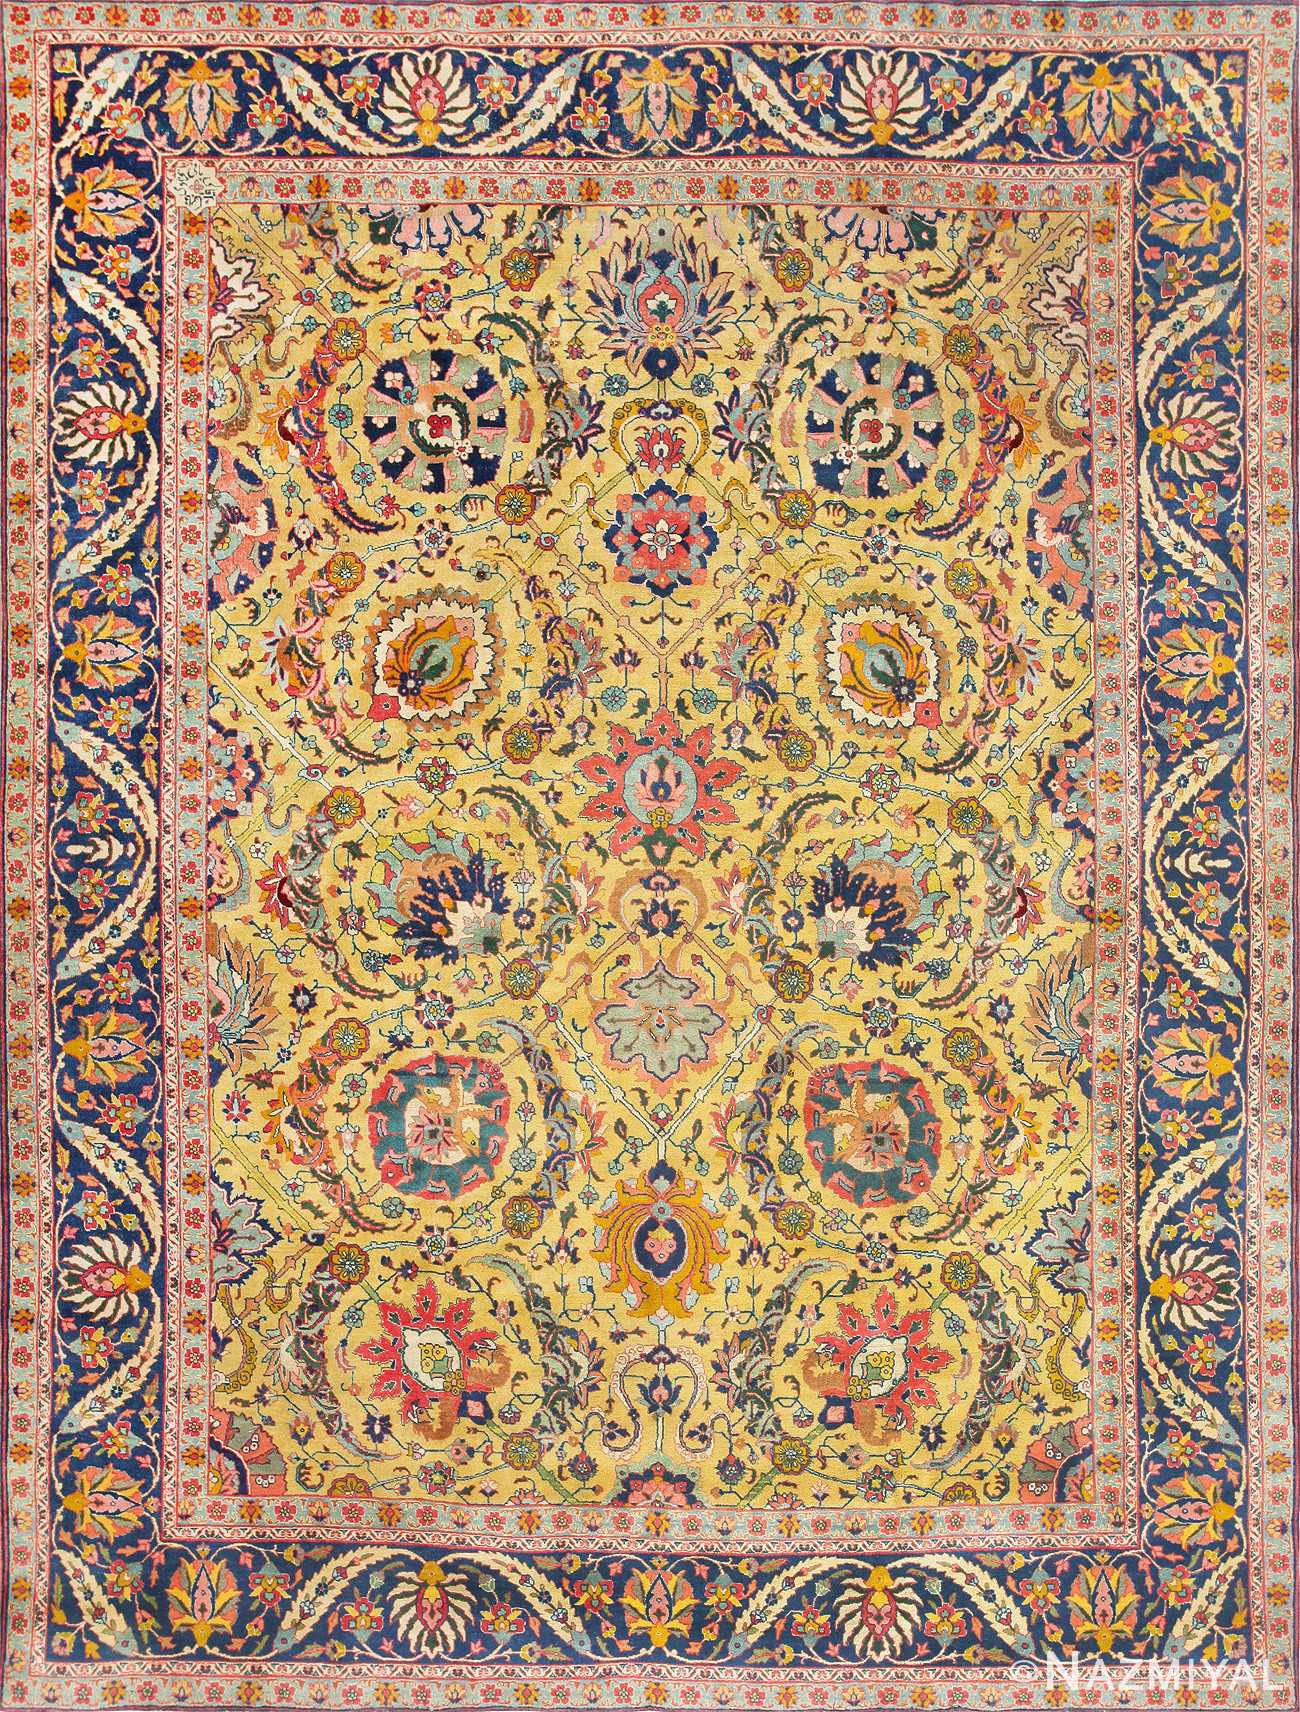 Antique Persian Sickle Leaf Carpet 47362 Large Image